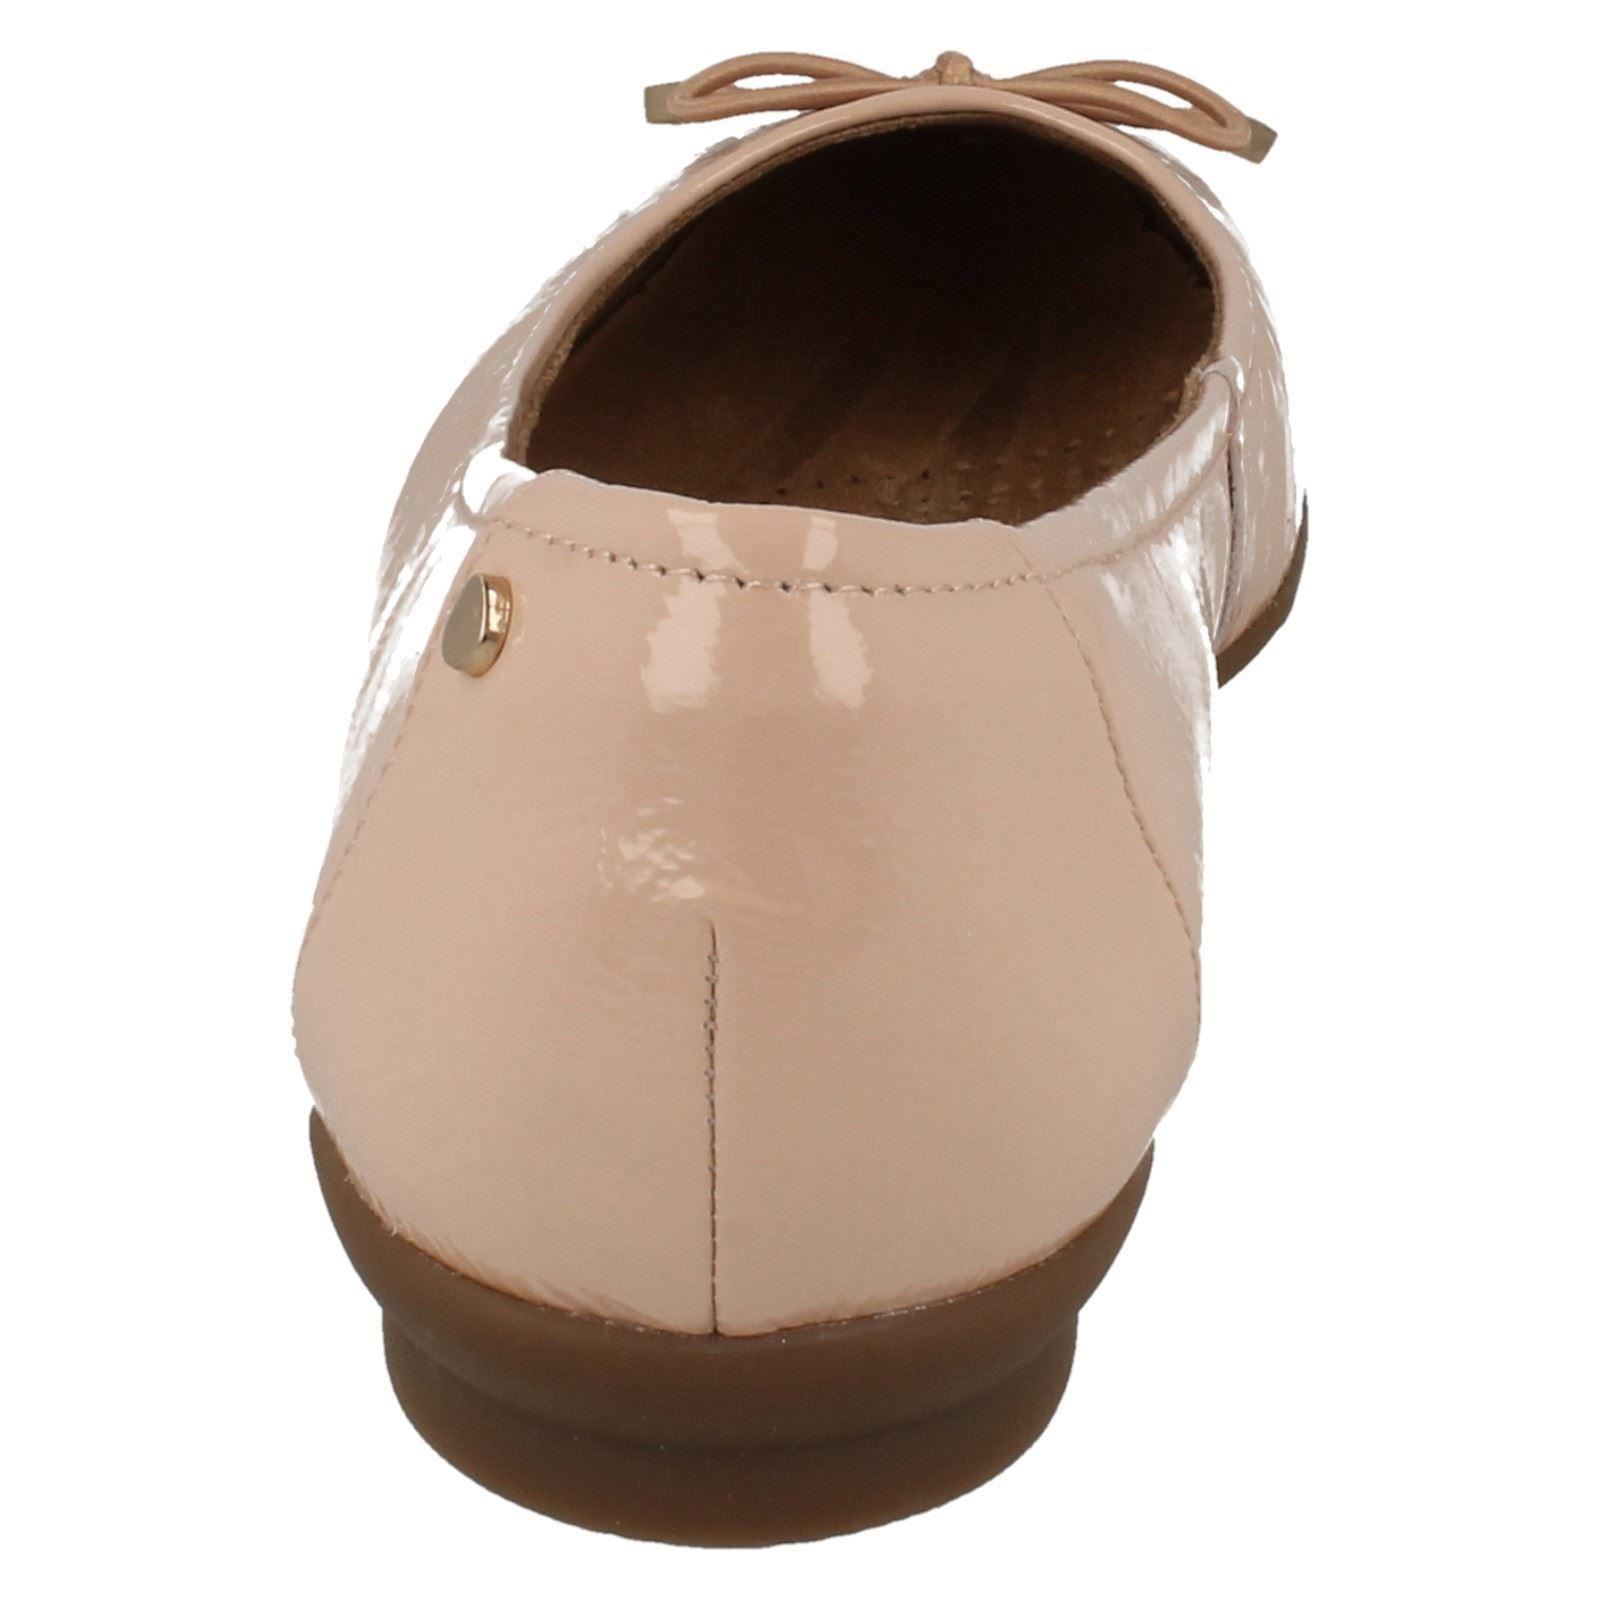 Ladies Clarks Ballerina Style Style Style Pumps 'Candra Light' c42bdc